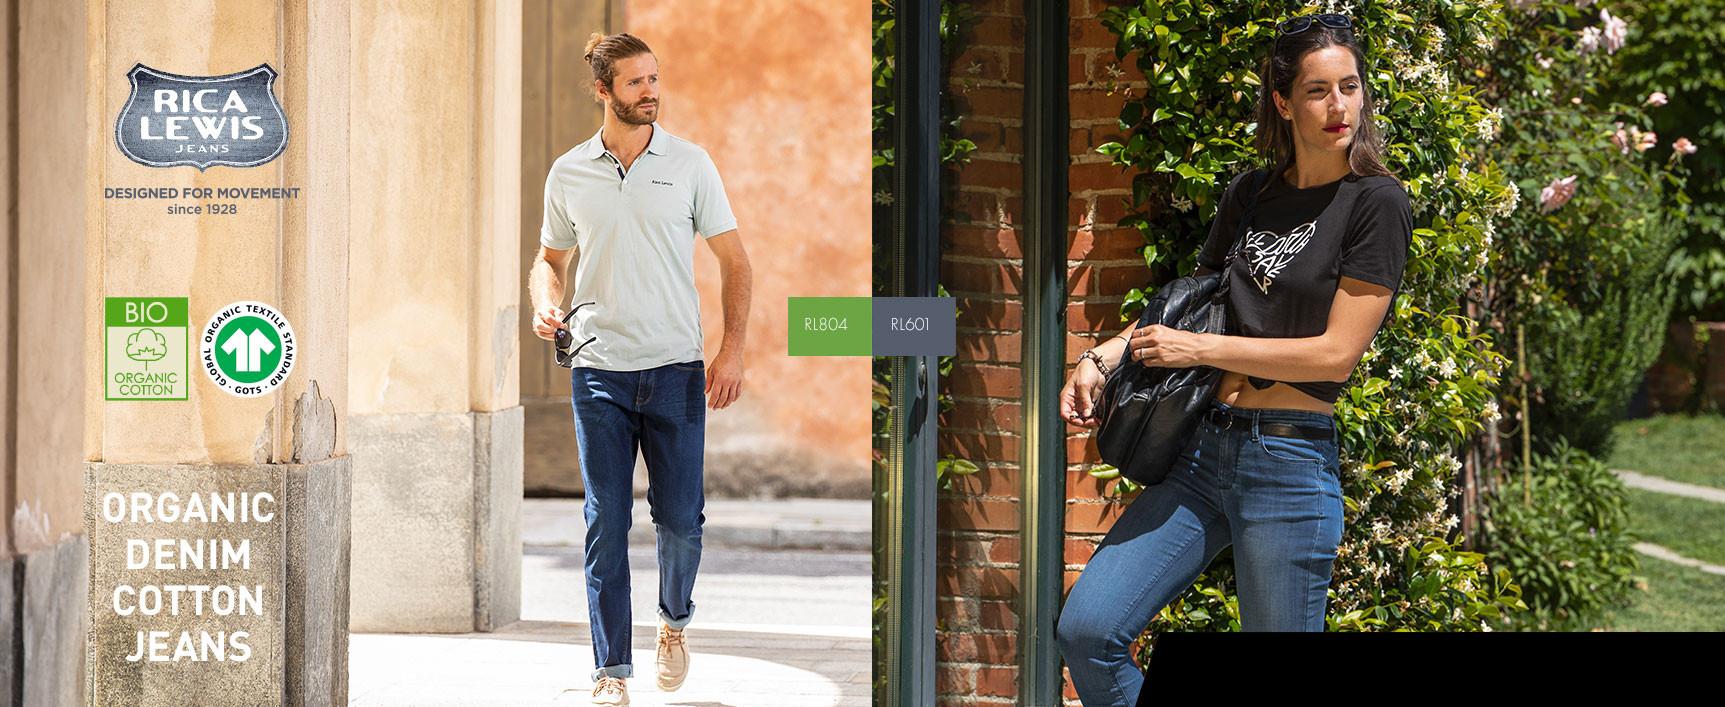 Rica Lewis : Organic Denim Cotton Jeans